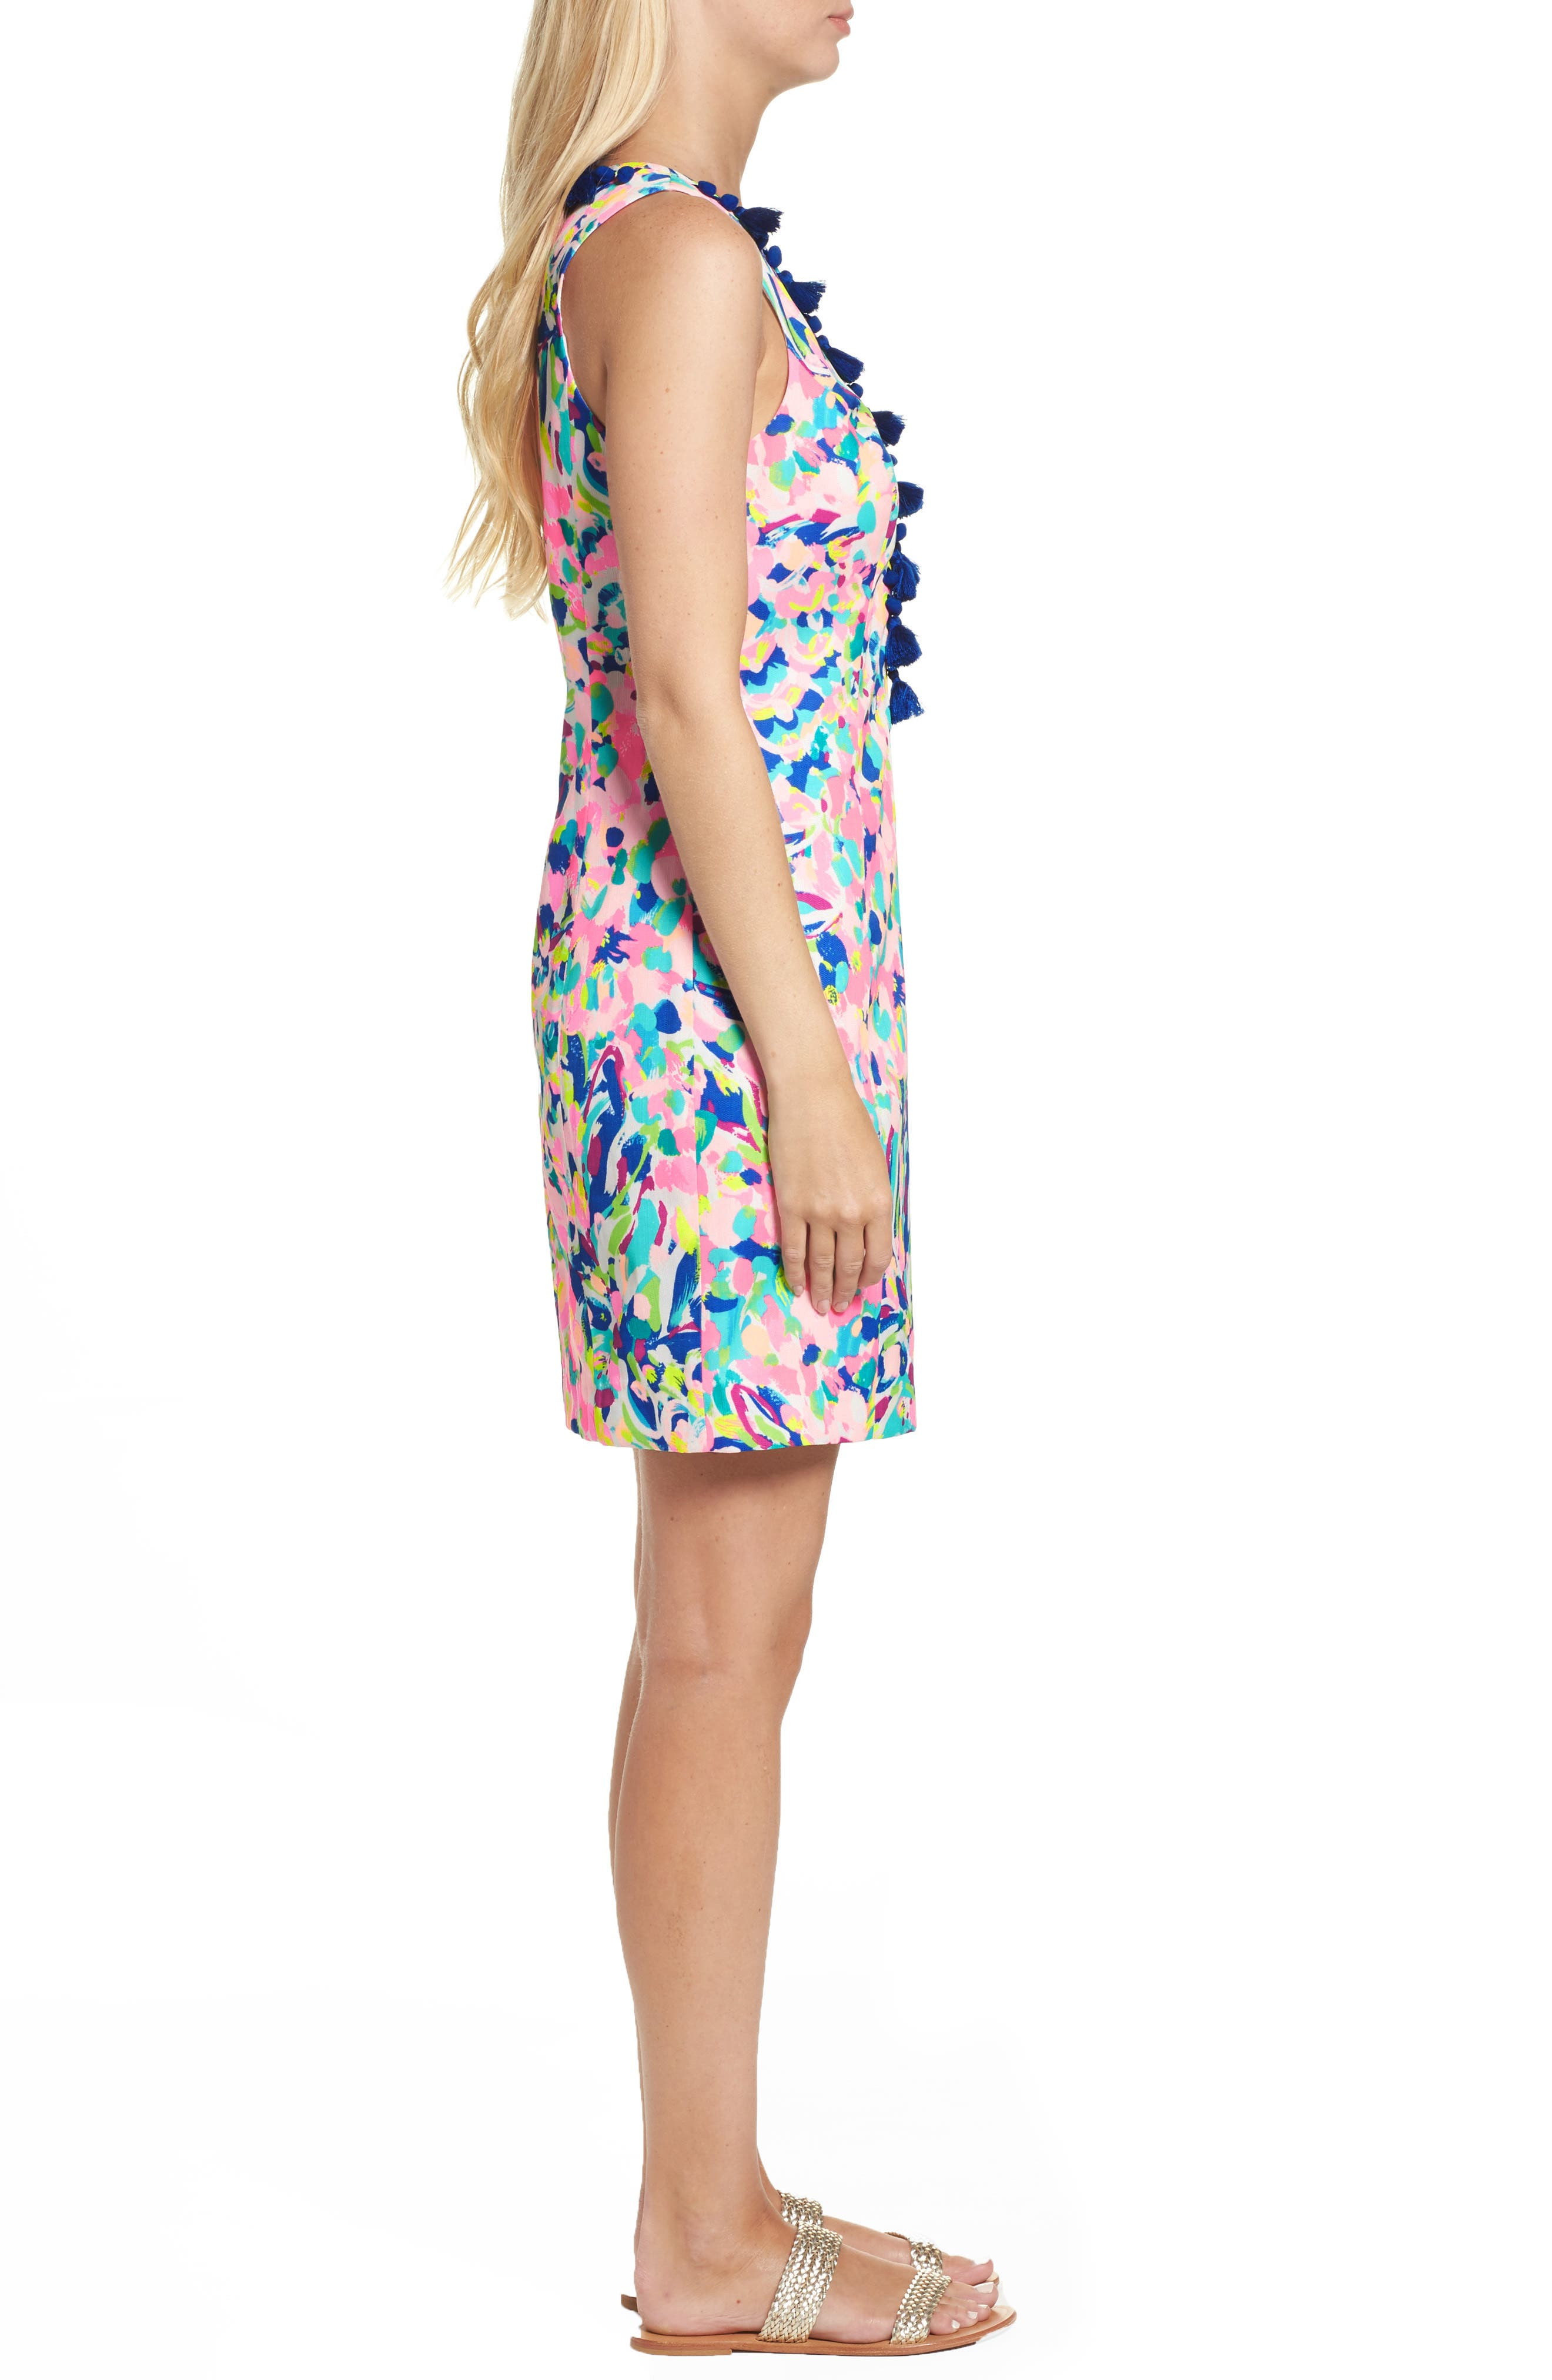 Cabrey Sheath Dress,                             Alternate thumbnail 3, color,                             Multi Pina Colada Club